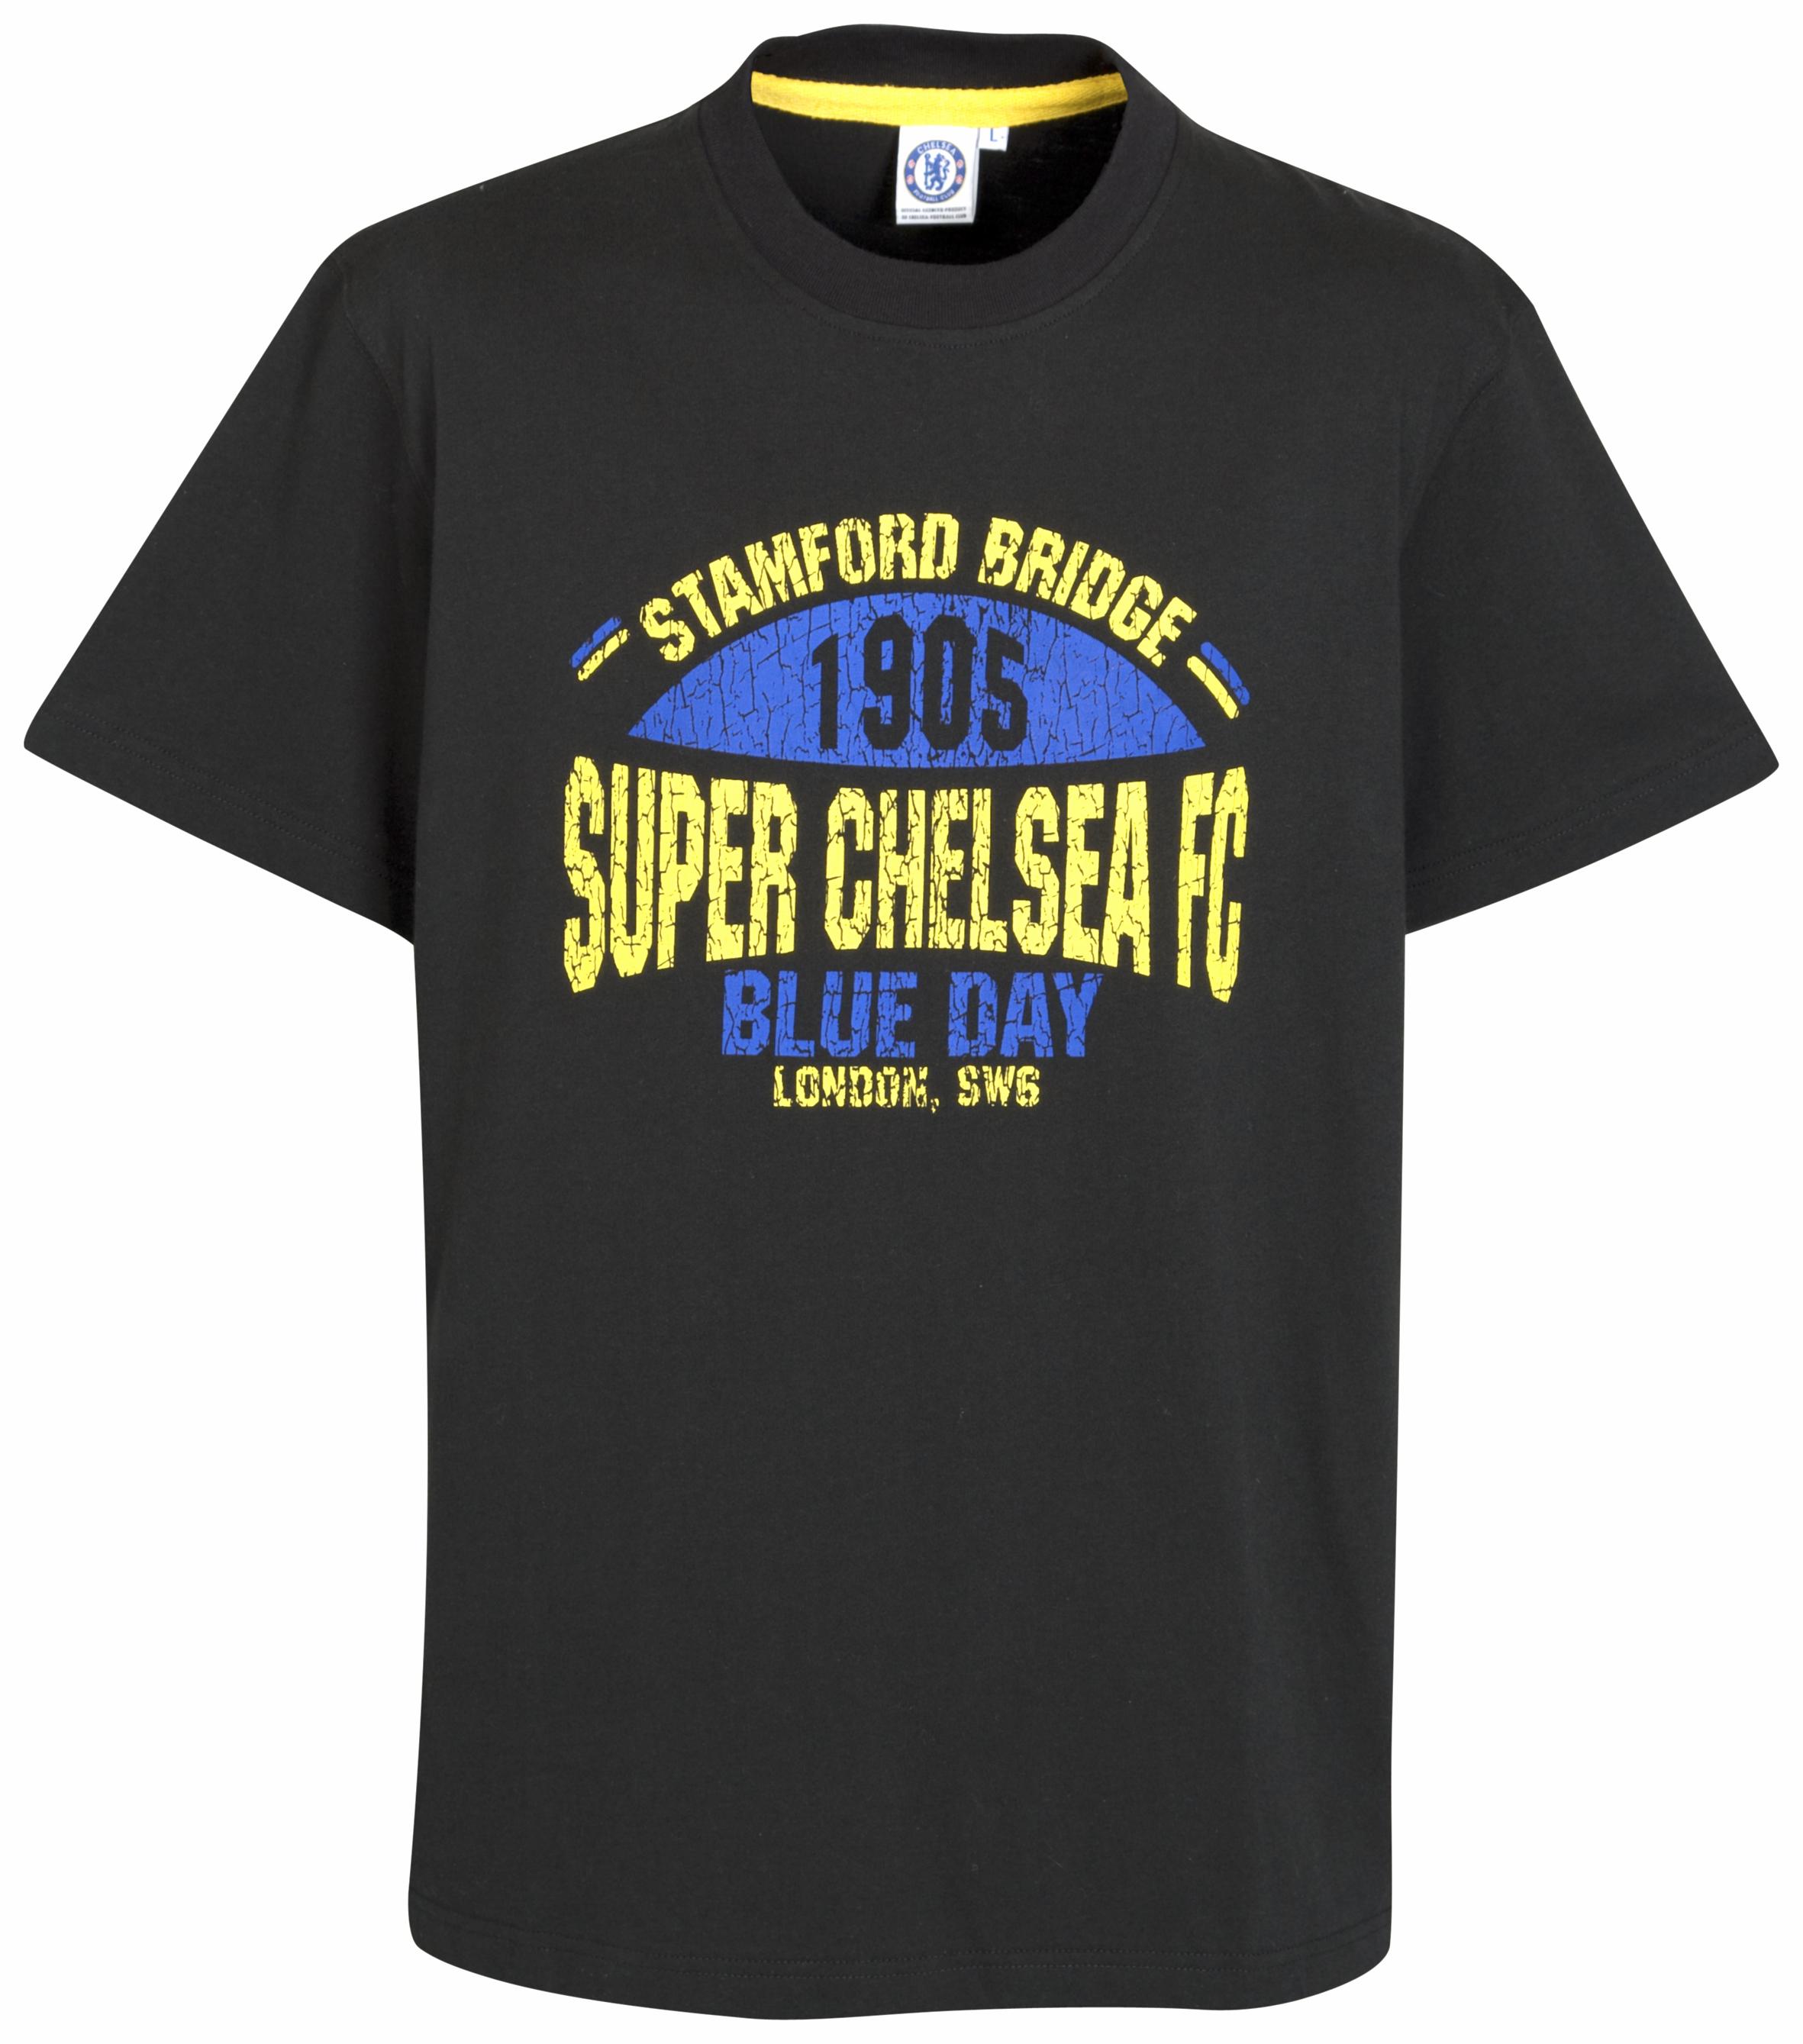 Chelsea Super Chelsea retro Graphic T Shirt Black